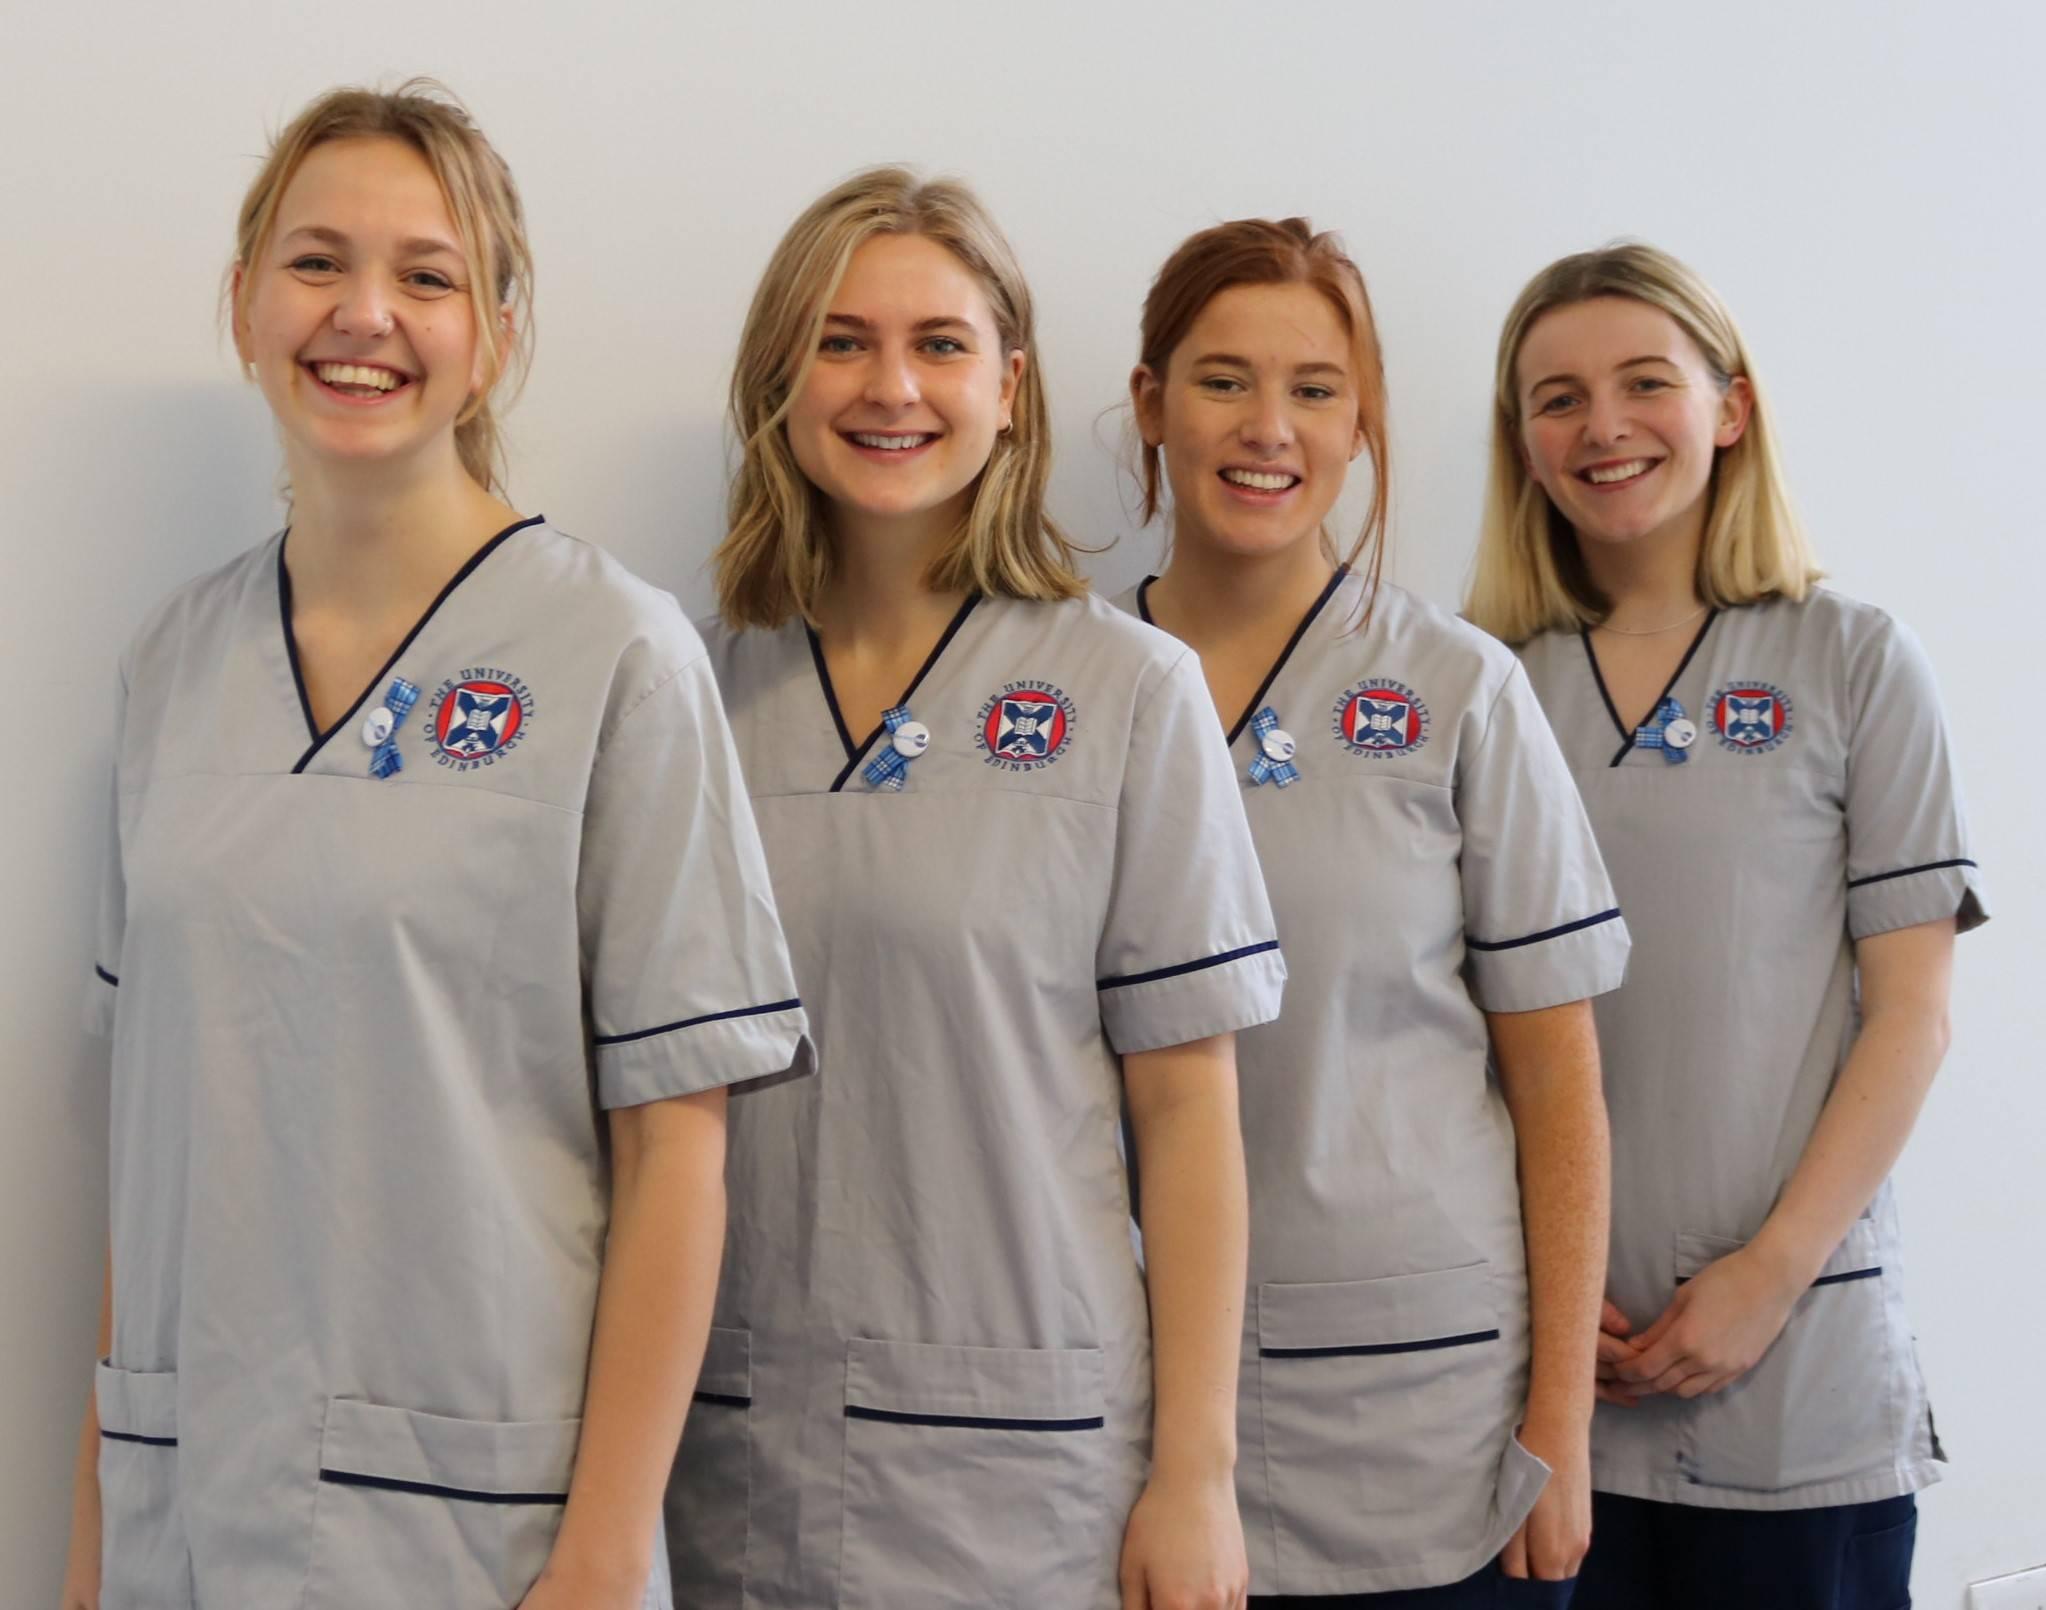 Nurses in Scotland wearing The Nursing Tartan